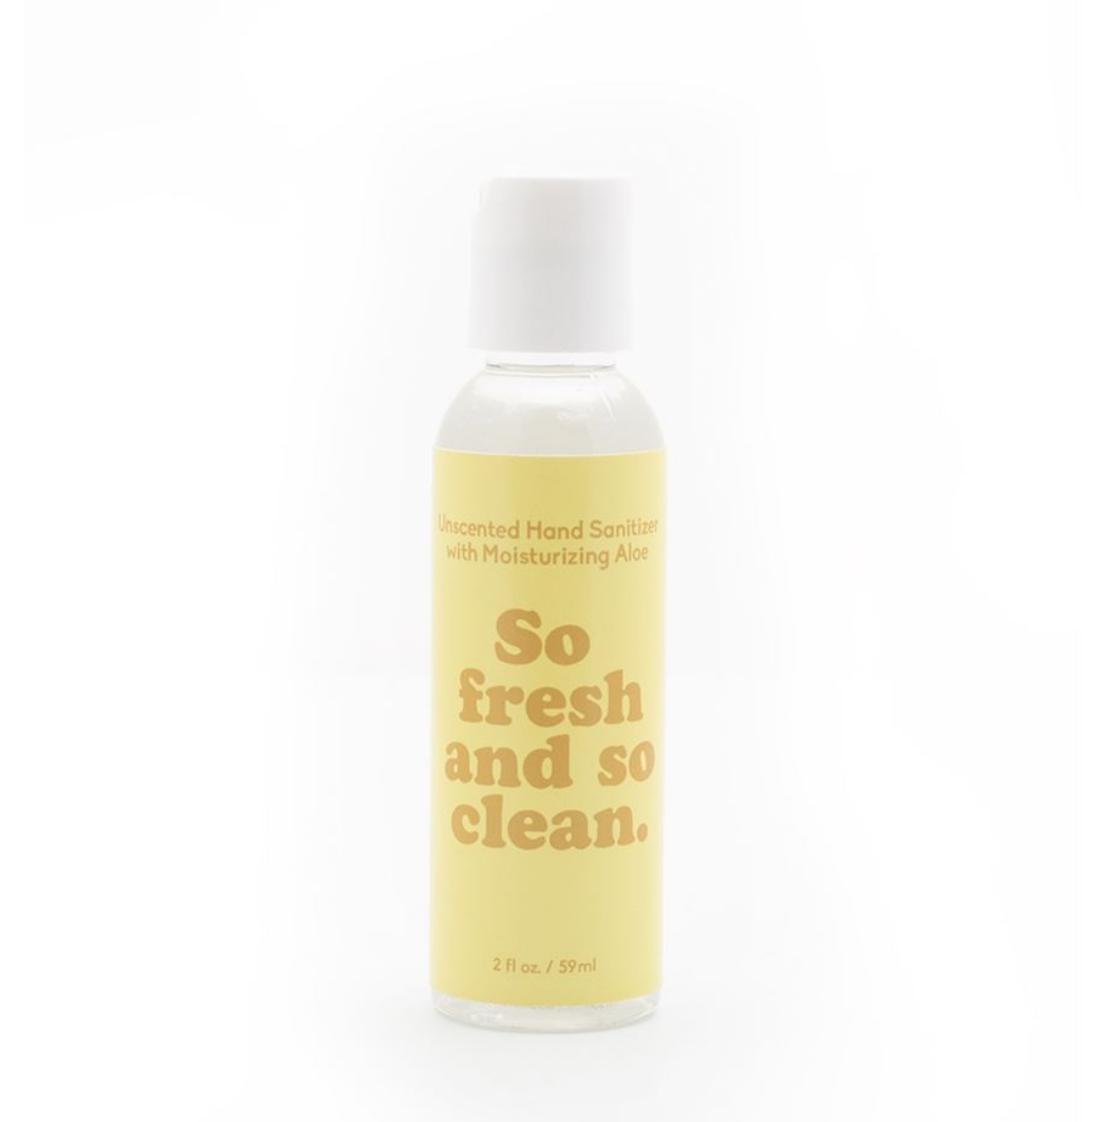 PADDYWAX Hand Sanitizer-So Fresh So Clean